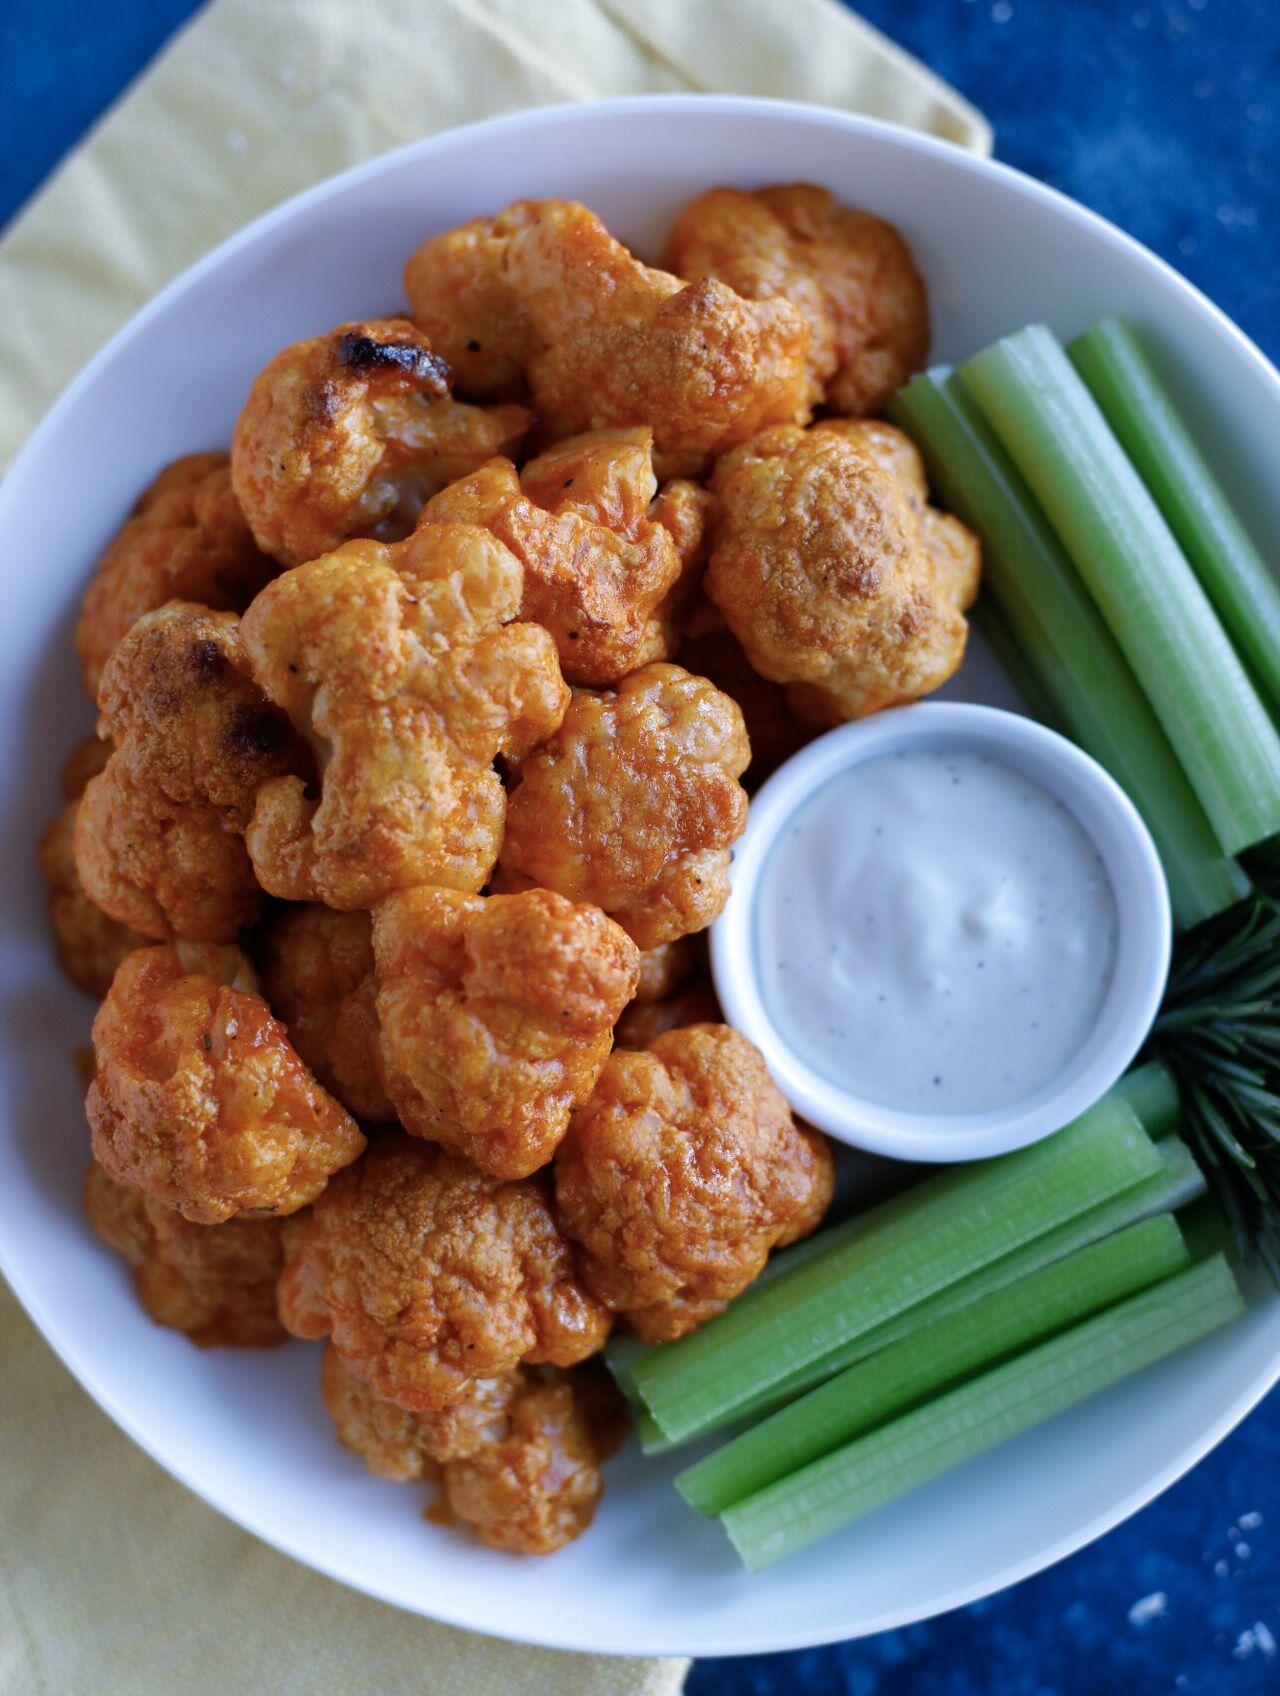 Things To Pair The Cauliflower Wings